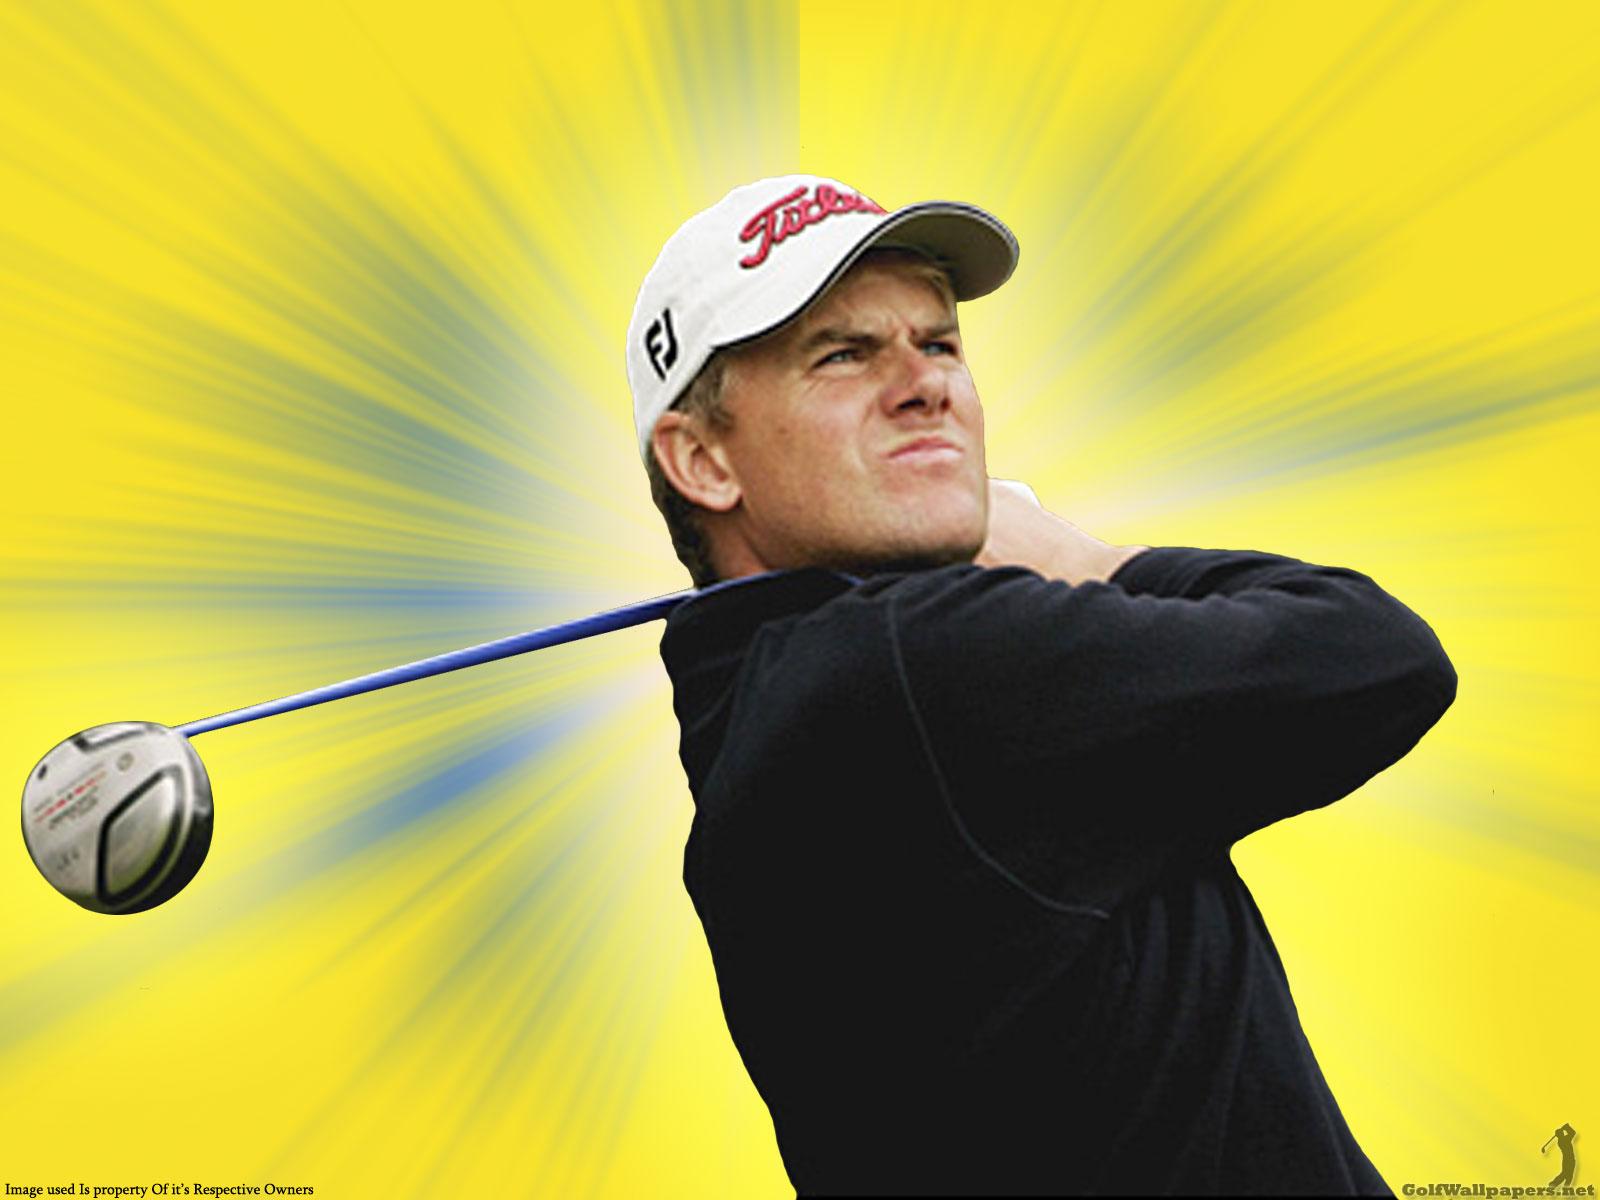 robert karlsson golf